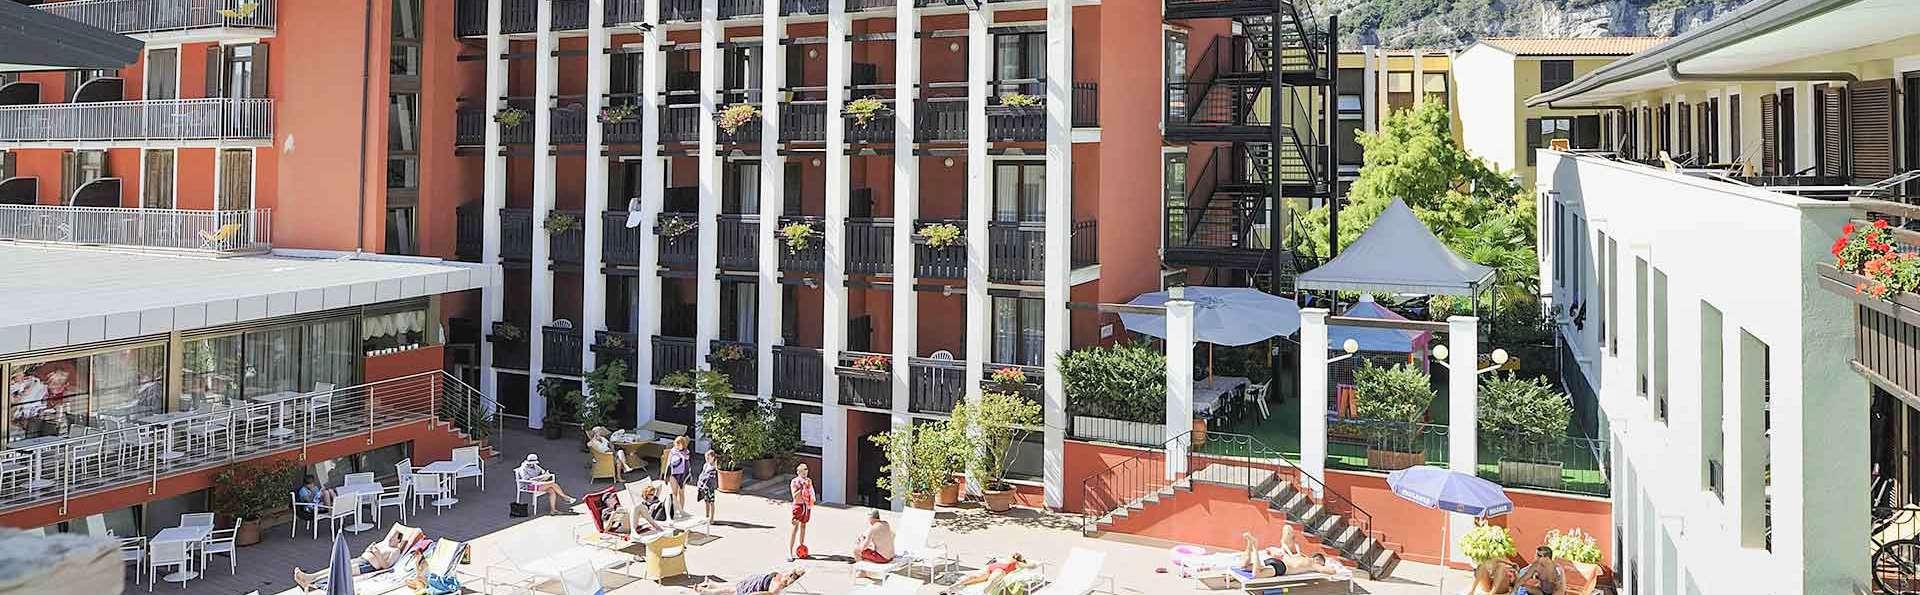 Club Hotel La Vela - EDIT_FRONT_1.jpg